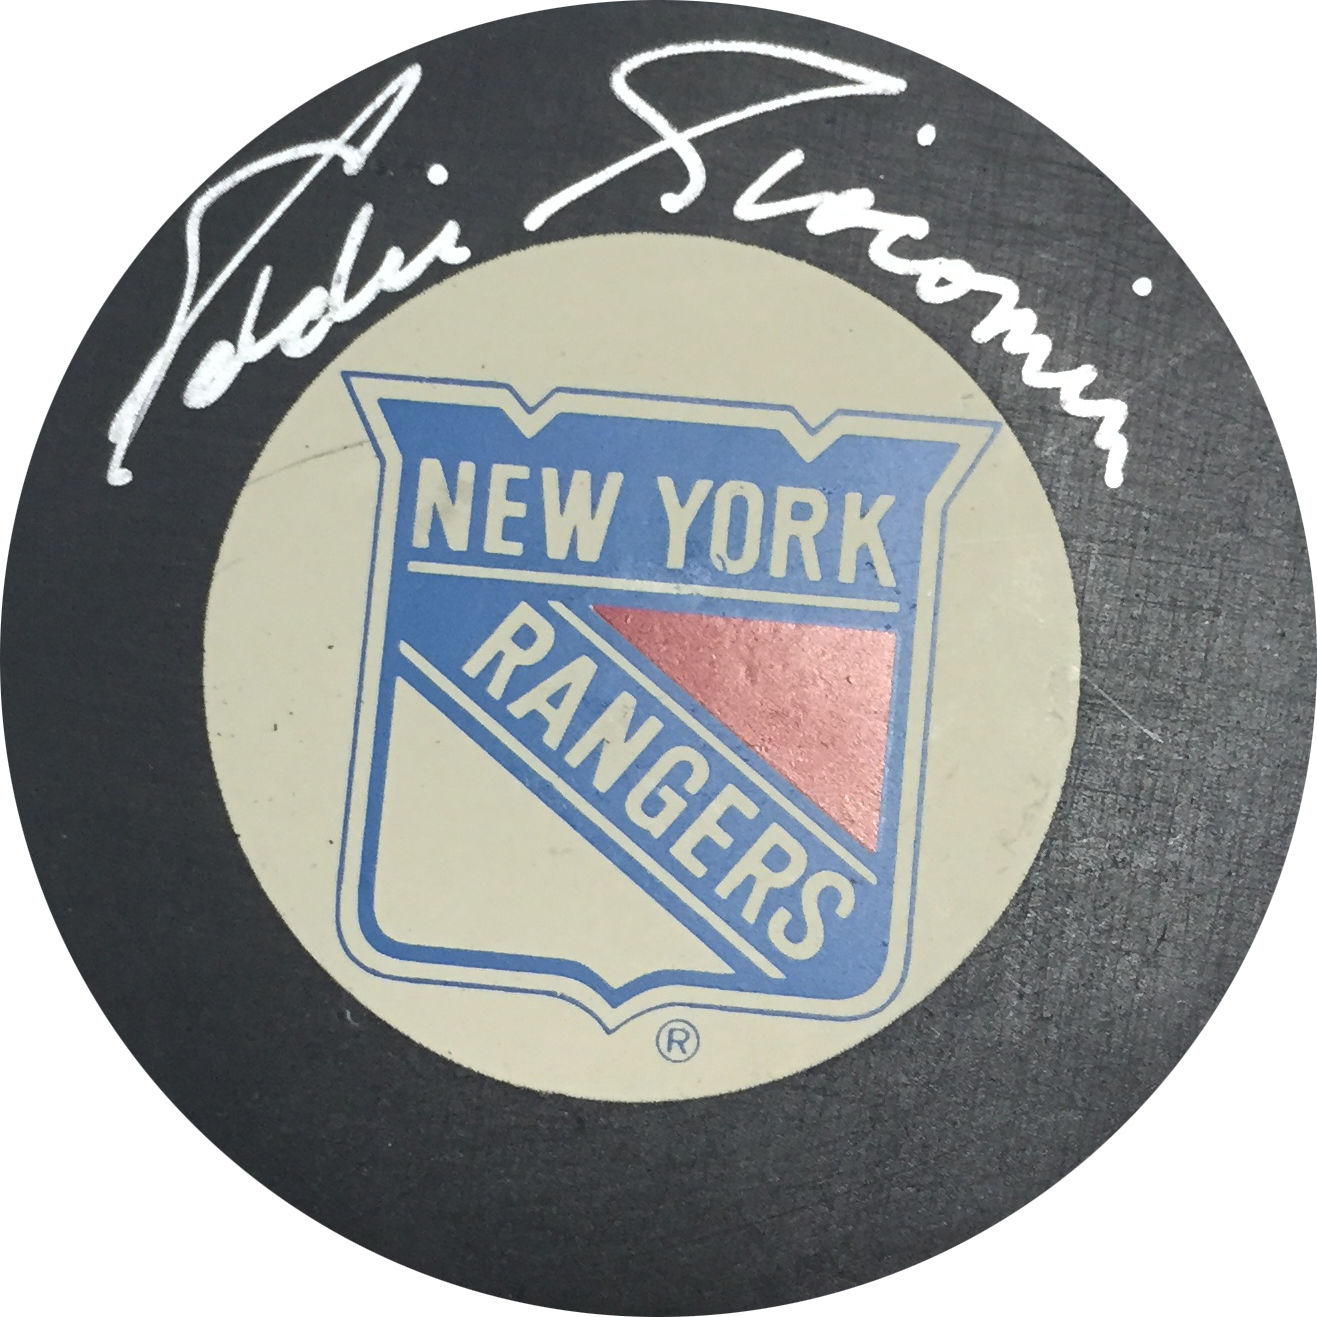 Eddie Giacomin Signed New York Rangers Puck BOLD Autograph HOF goalie cbm COA